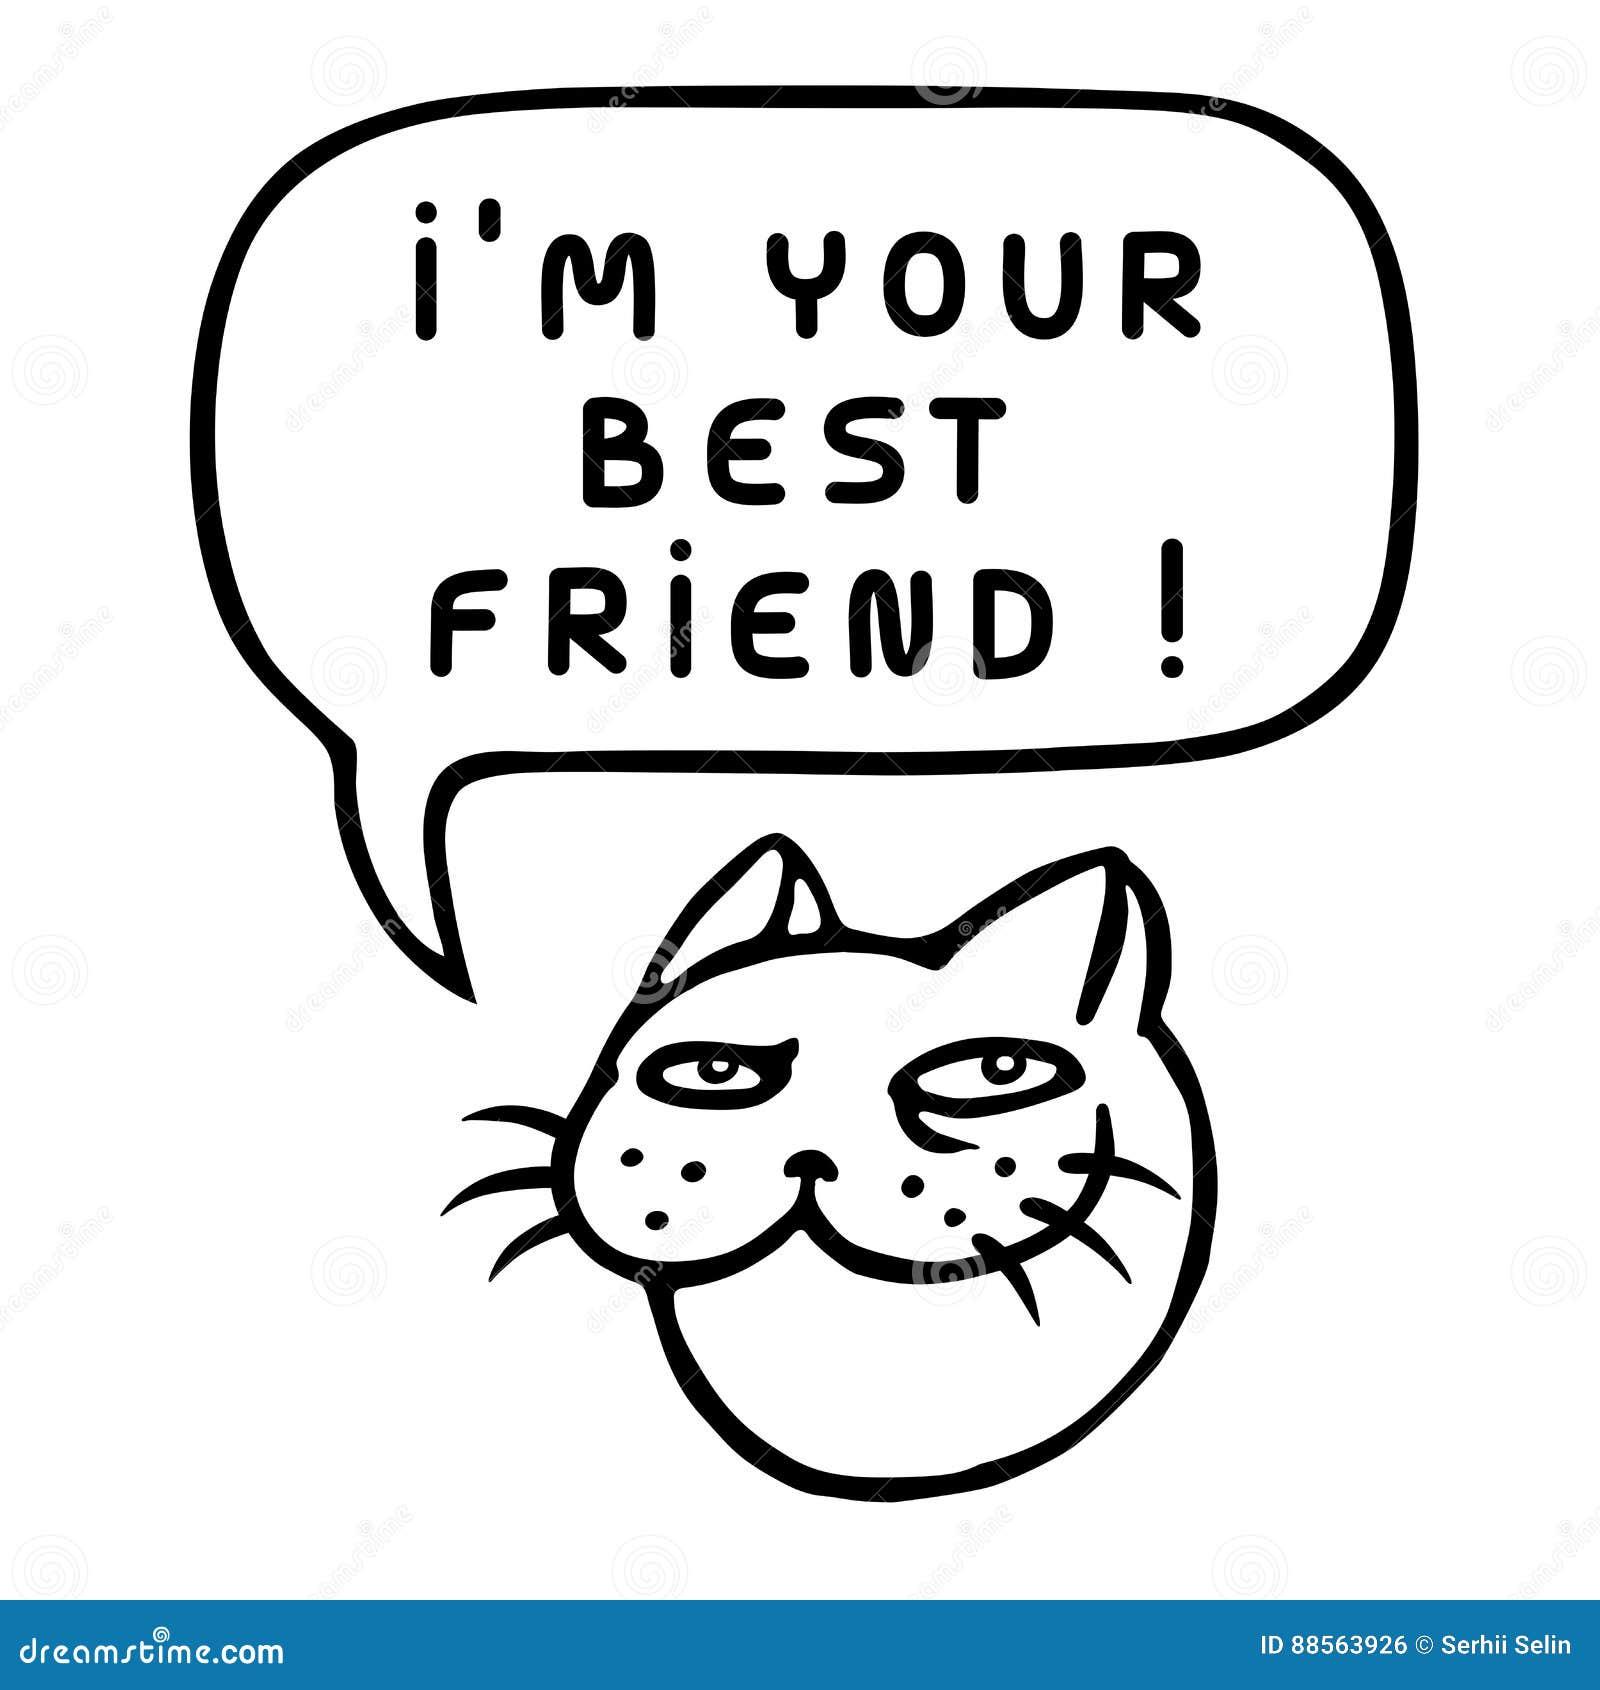 speech for your best friend